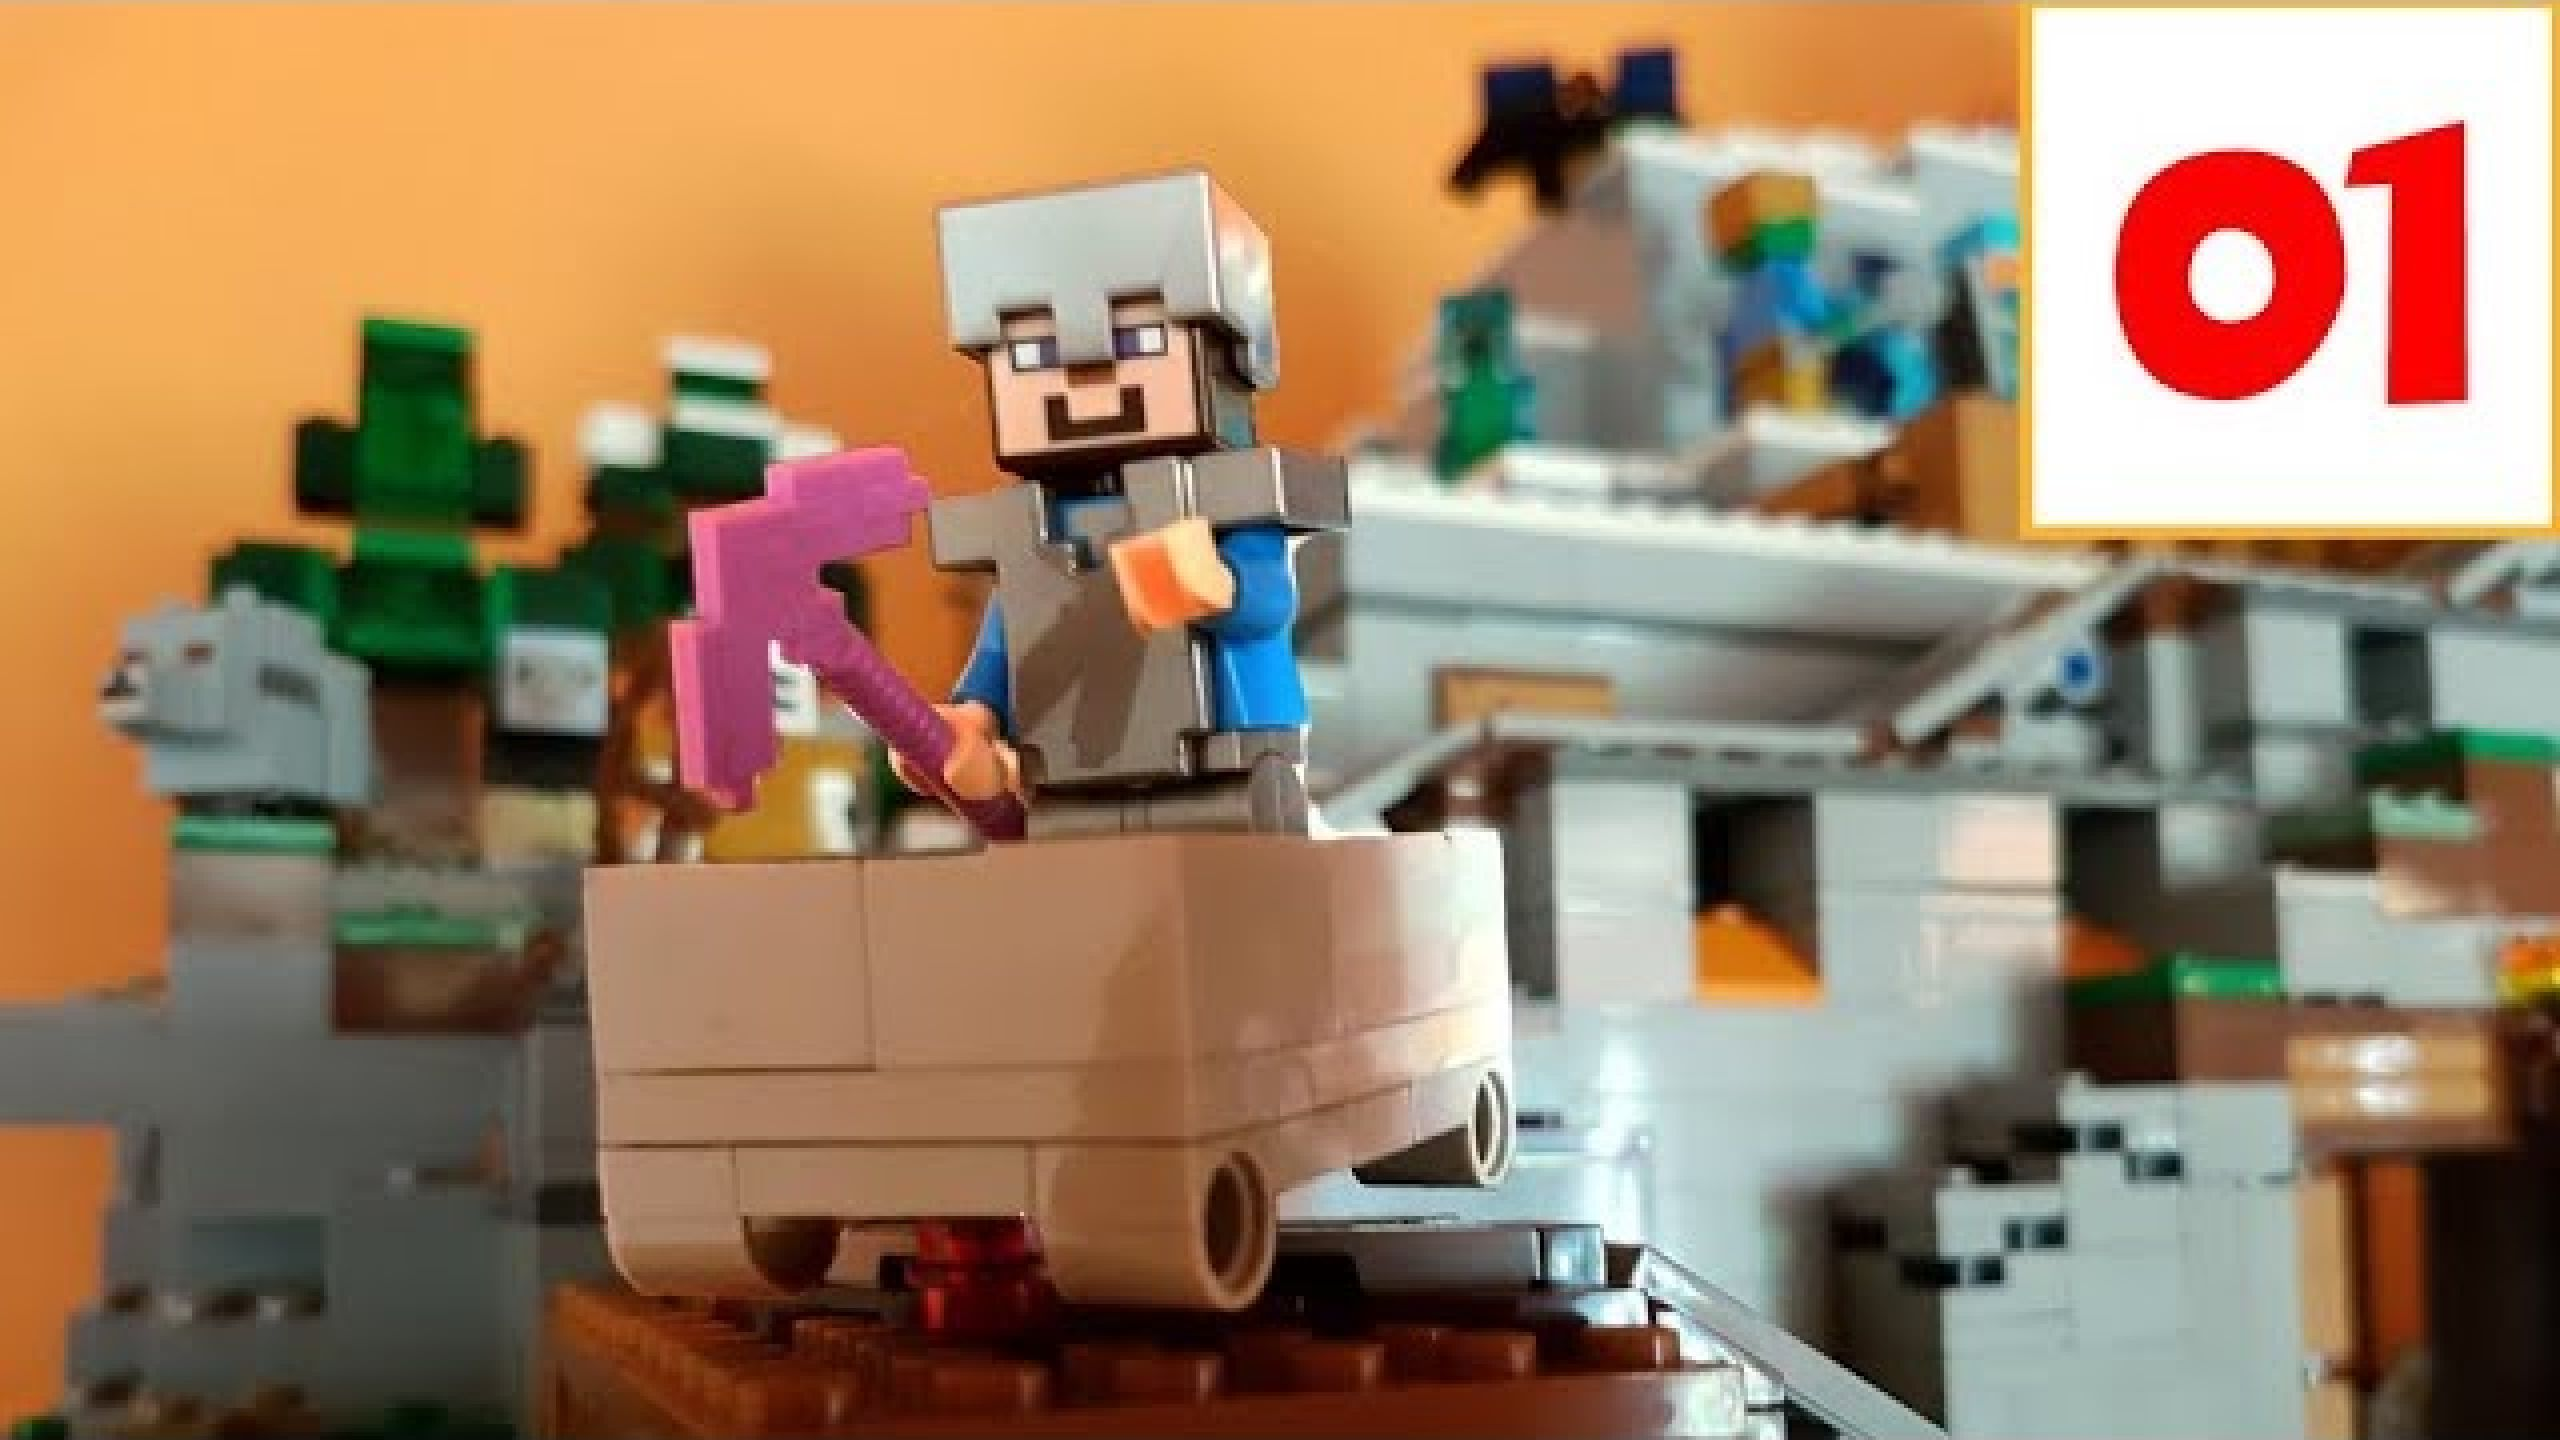 Lego Calendrier.La Mine Minecraft De Lego Presentation Du Calendrier De L